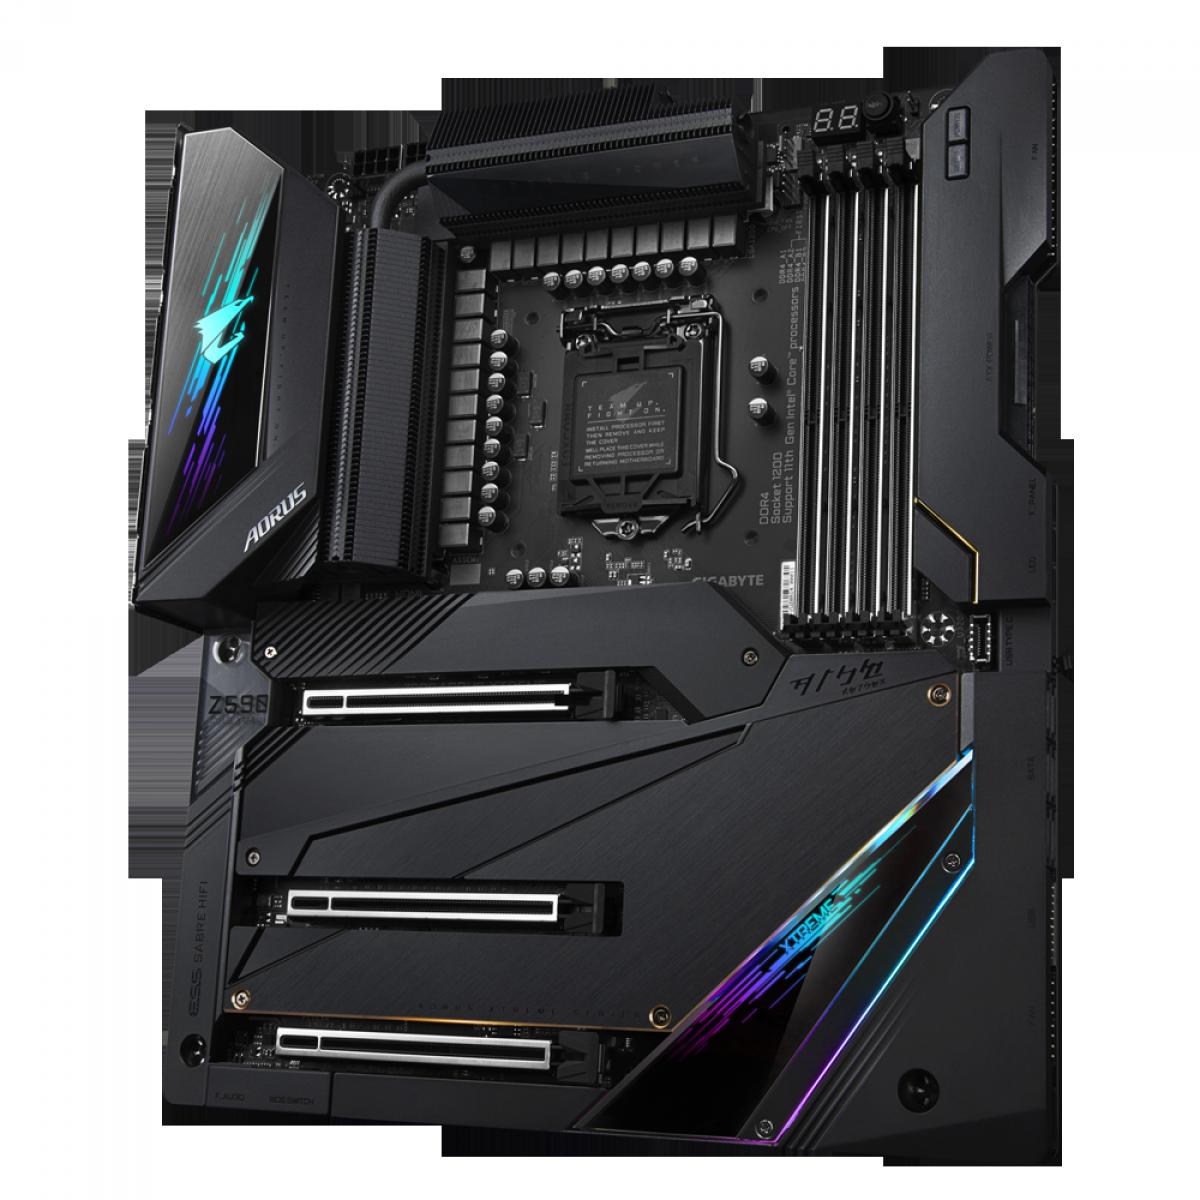 Placa Mãe GIGABYTE Z590 AORUS XTREME, Intel Z590 Express Chipset, Socket 1200, E-ATX, DDR4